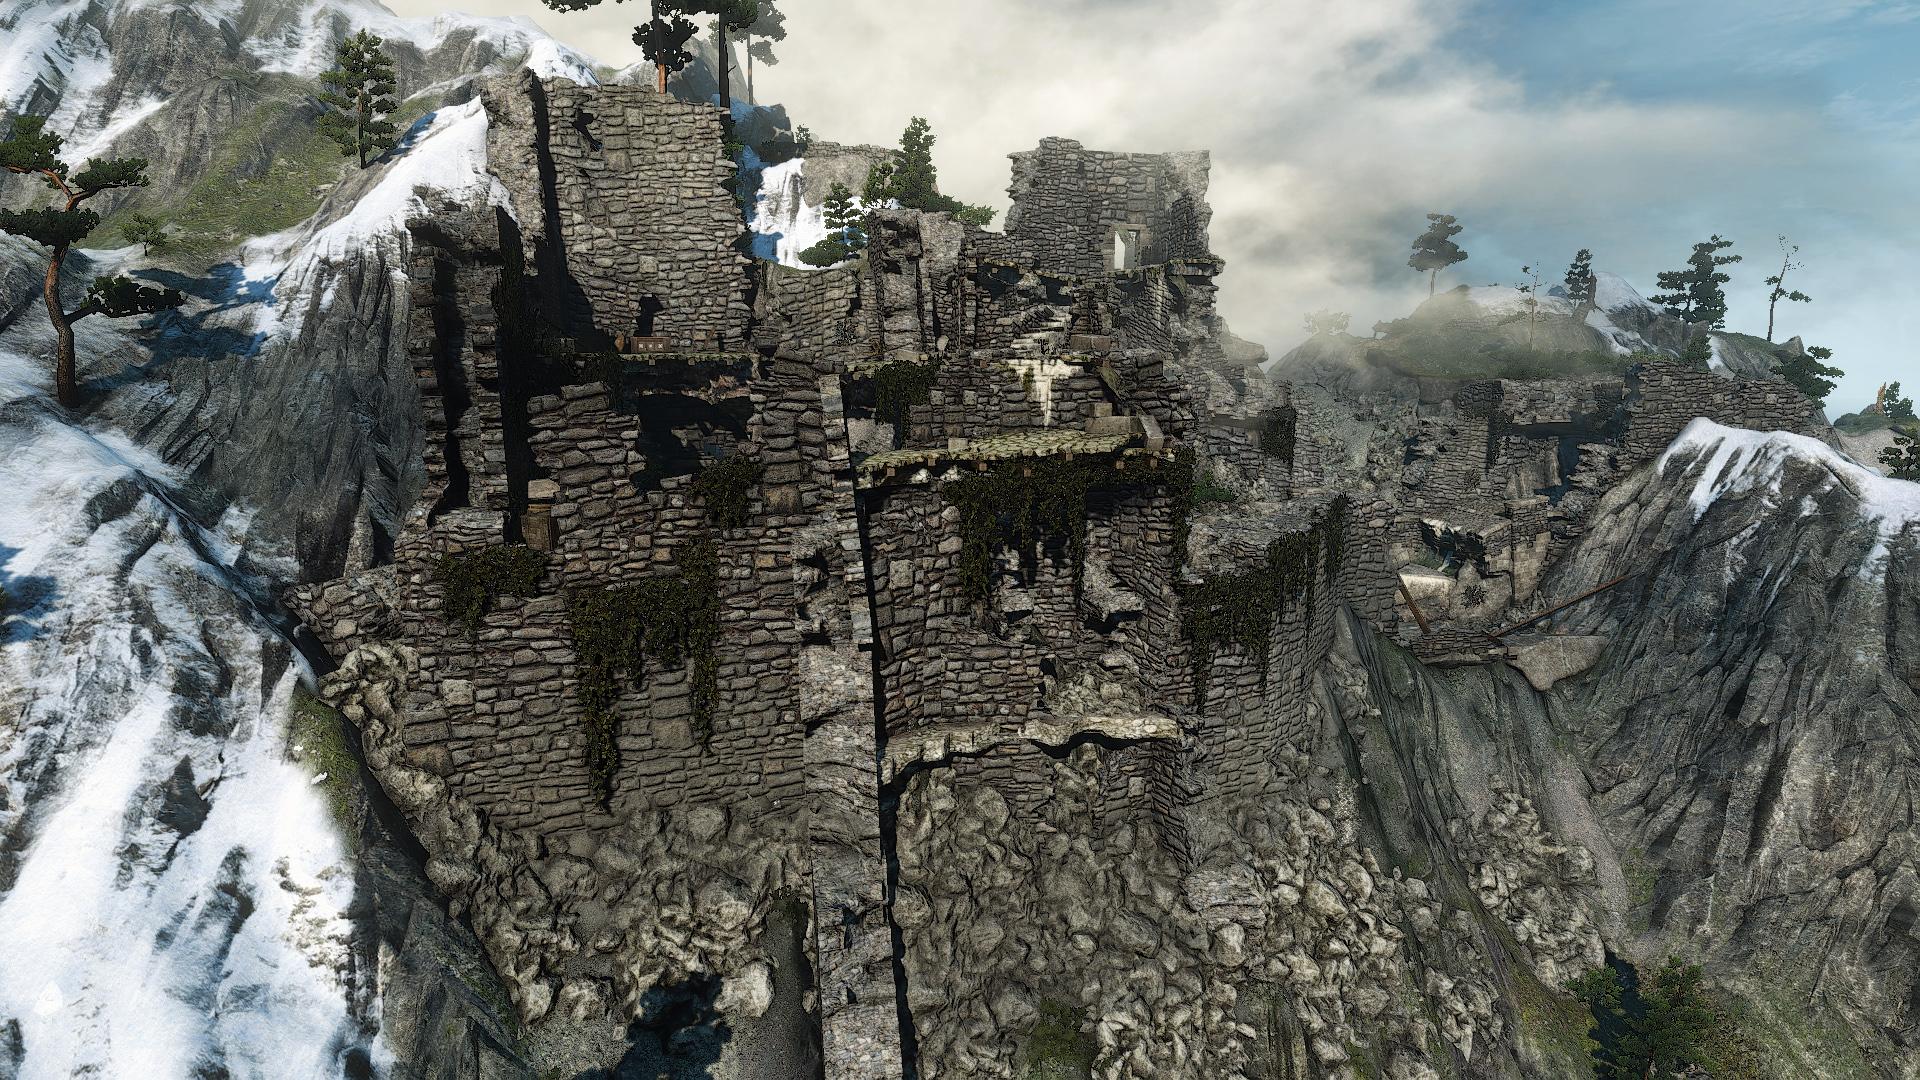 Castle Tuirseach